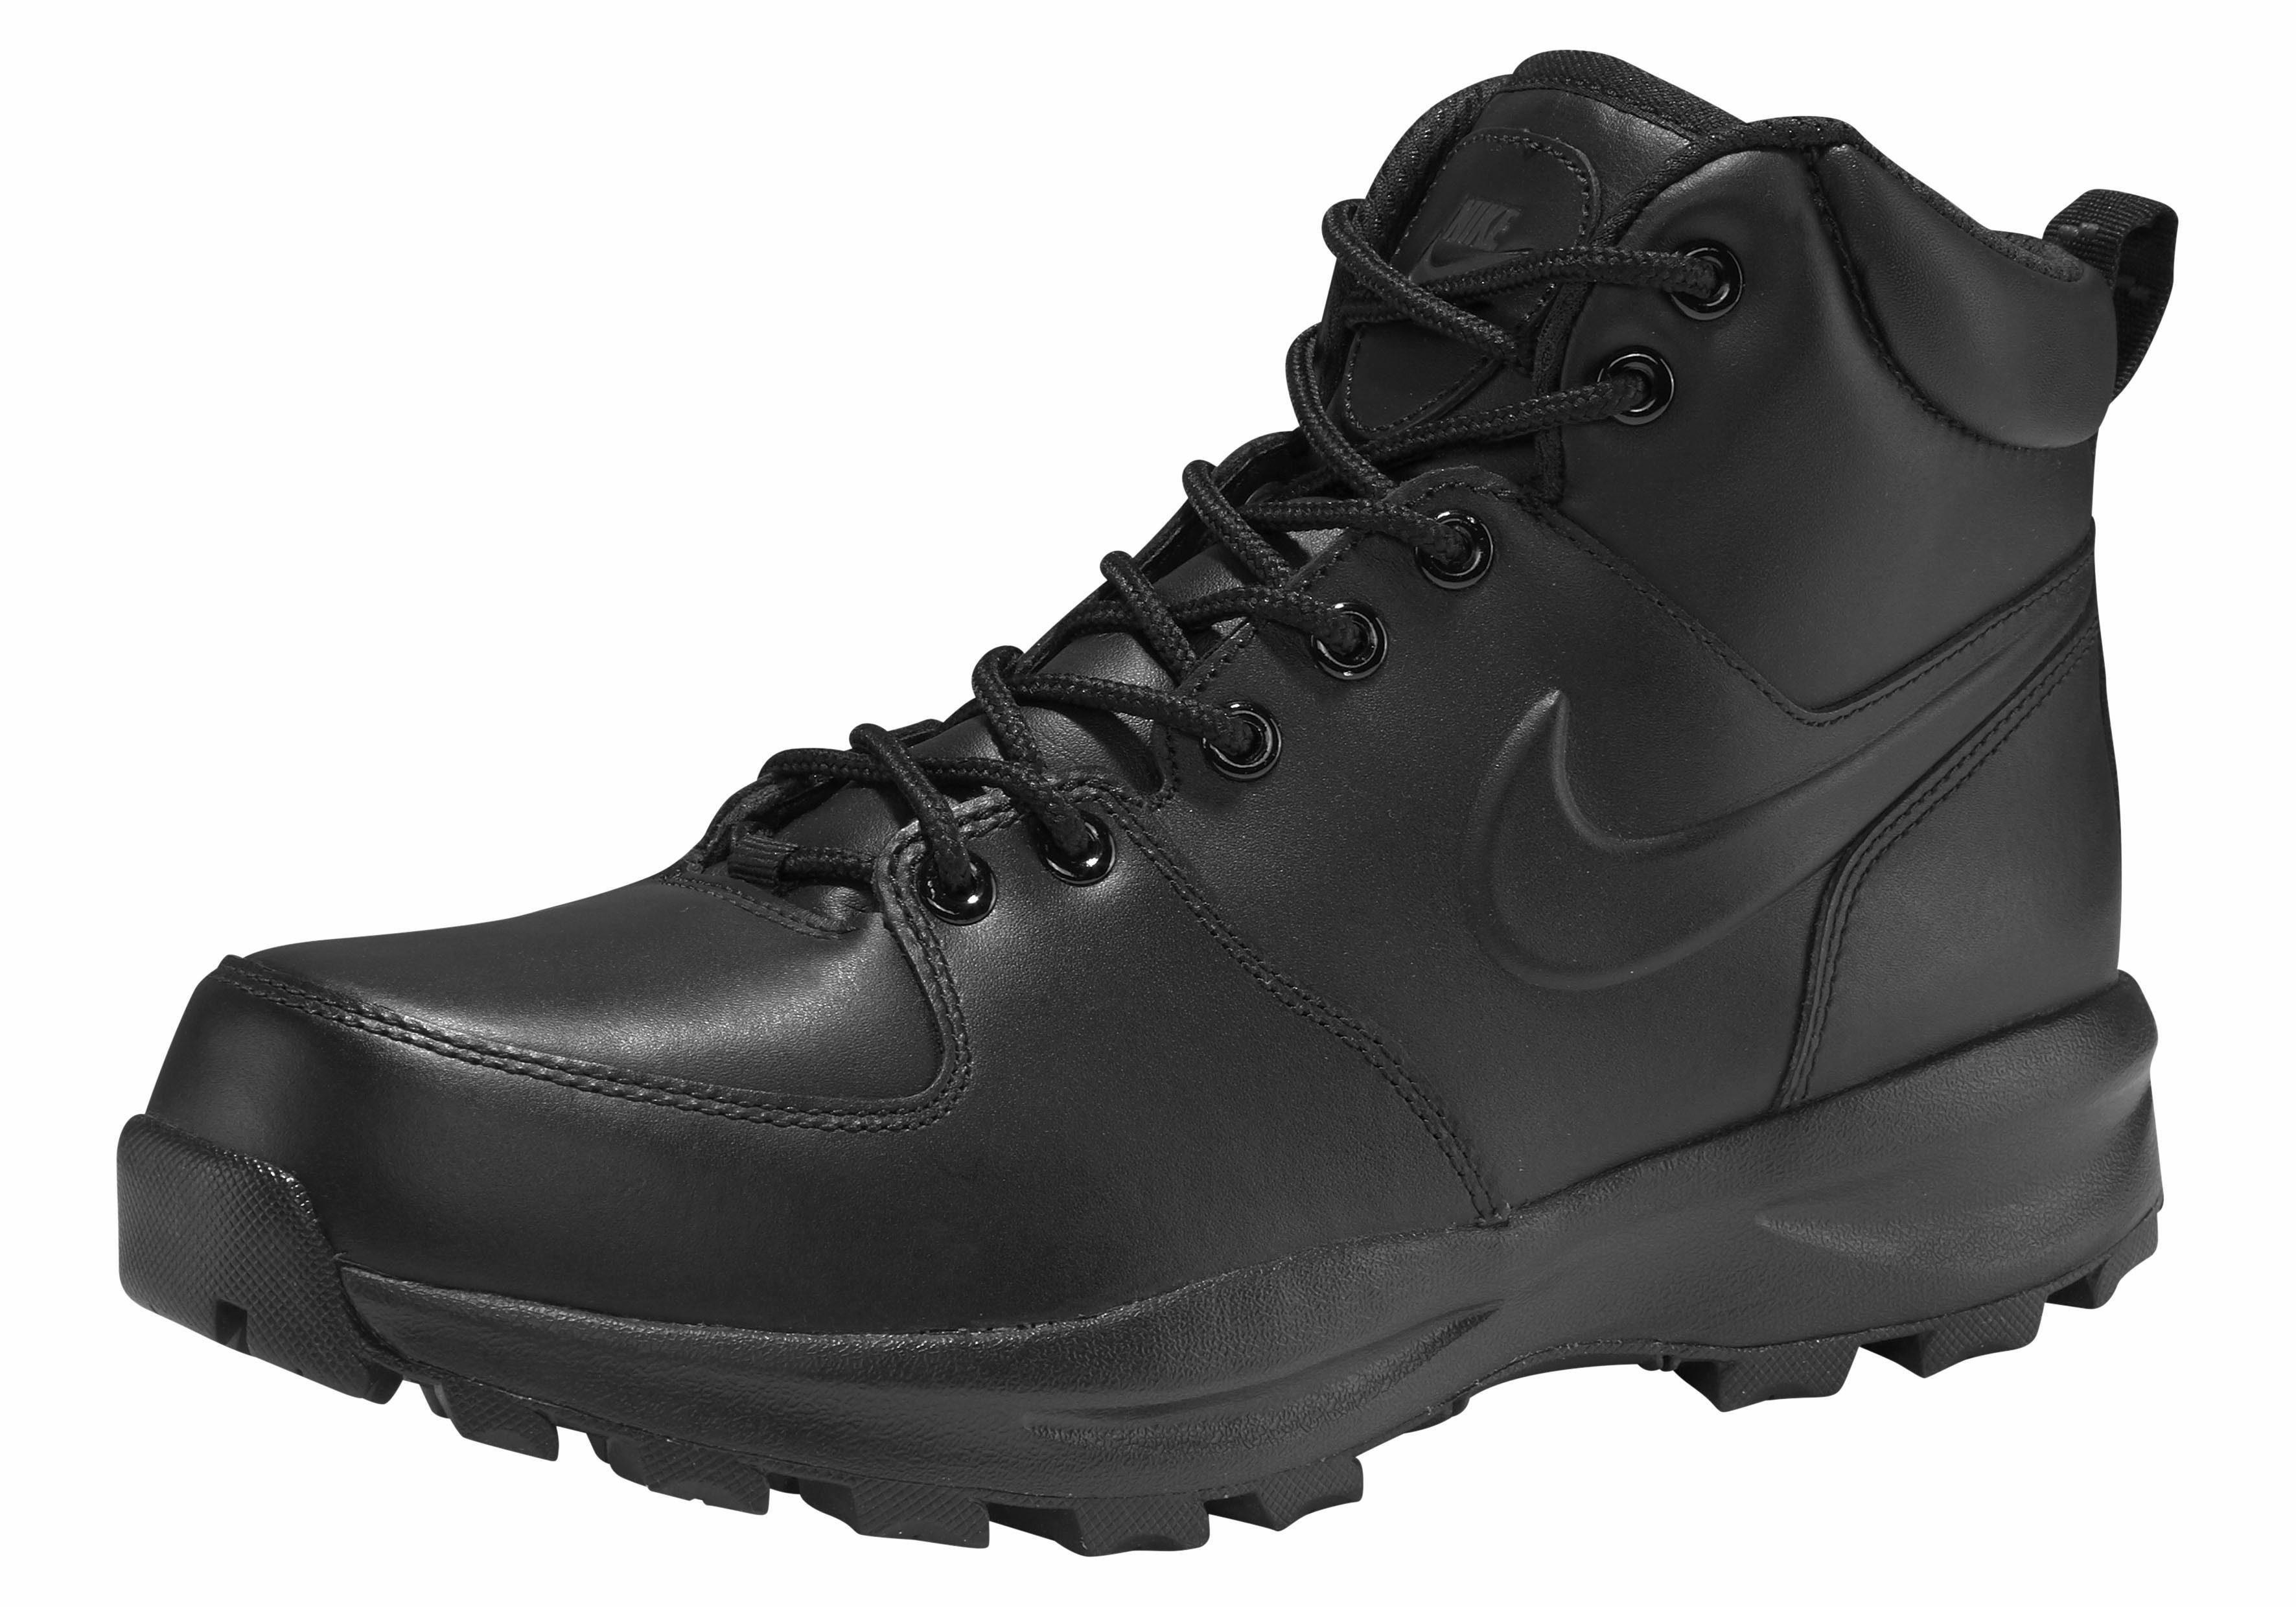 Nike Sportswear »Manoa Leather« Schnürboots kaufen   OTTO